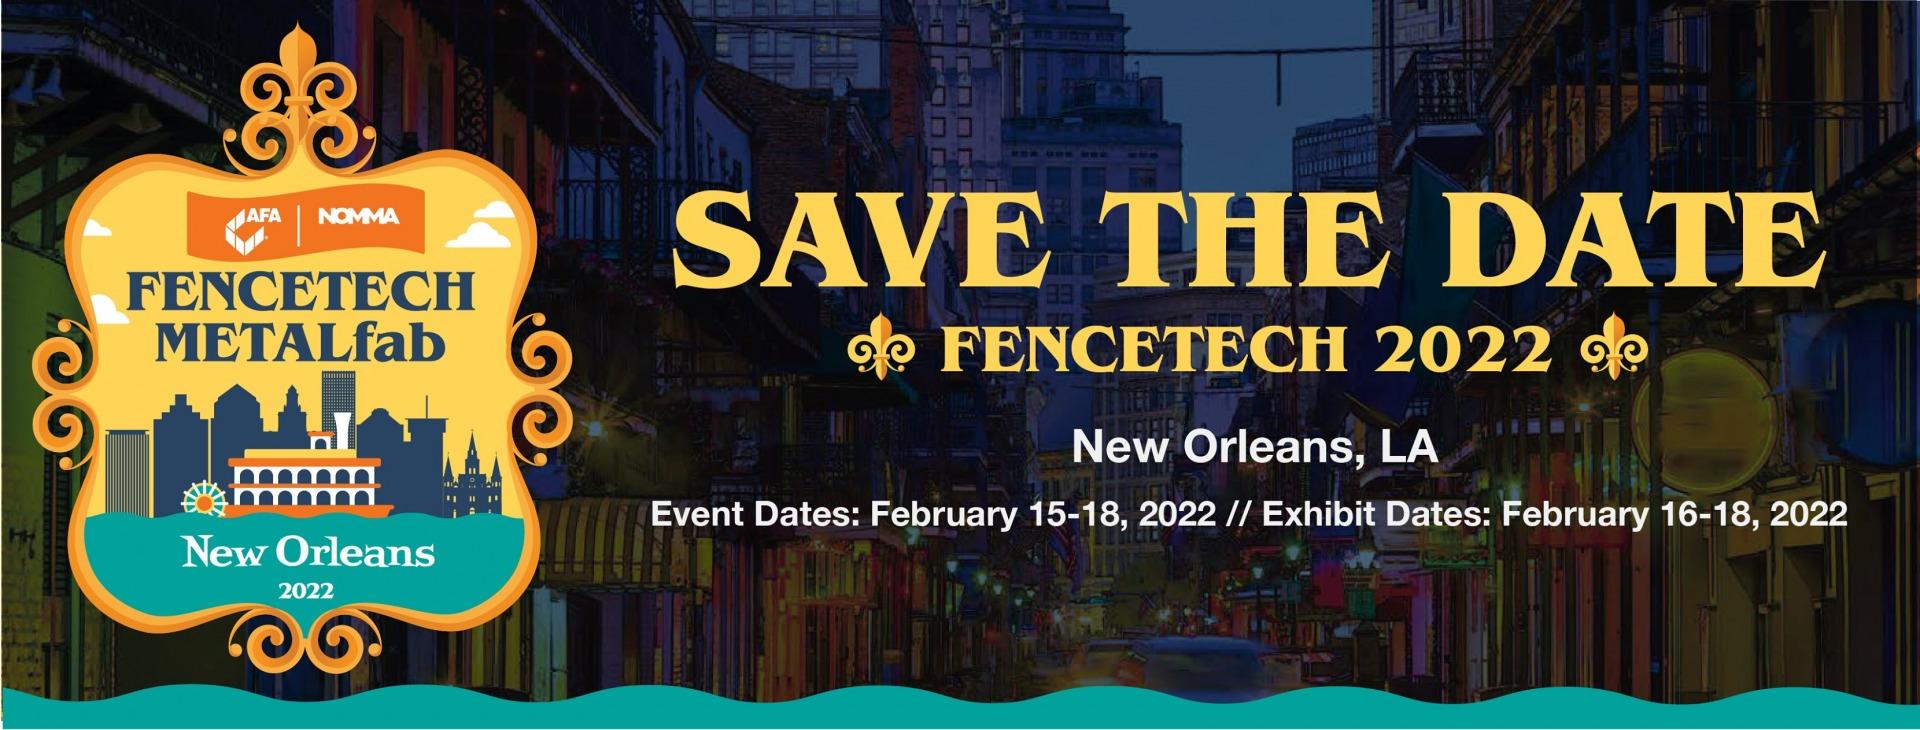 FENCETECH logo and event dates: Feb 15-18, 2022. Exhibit dates: Feb. 16-18, 2022